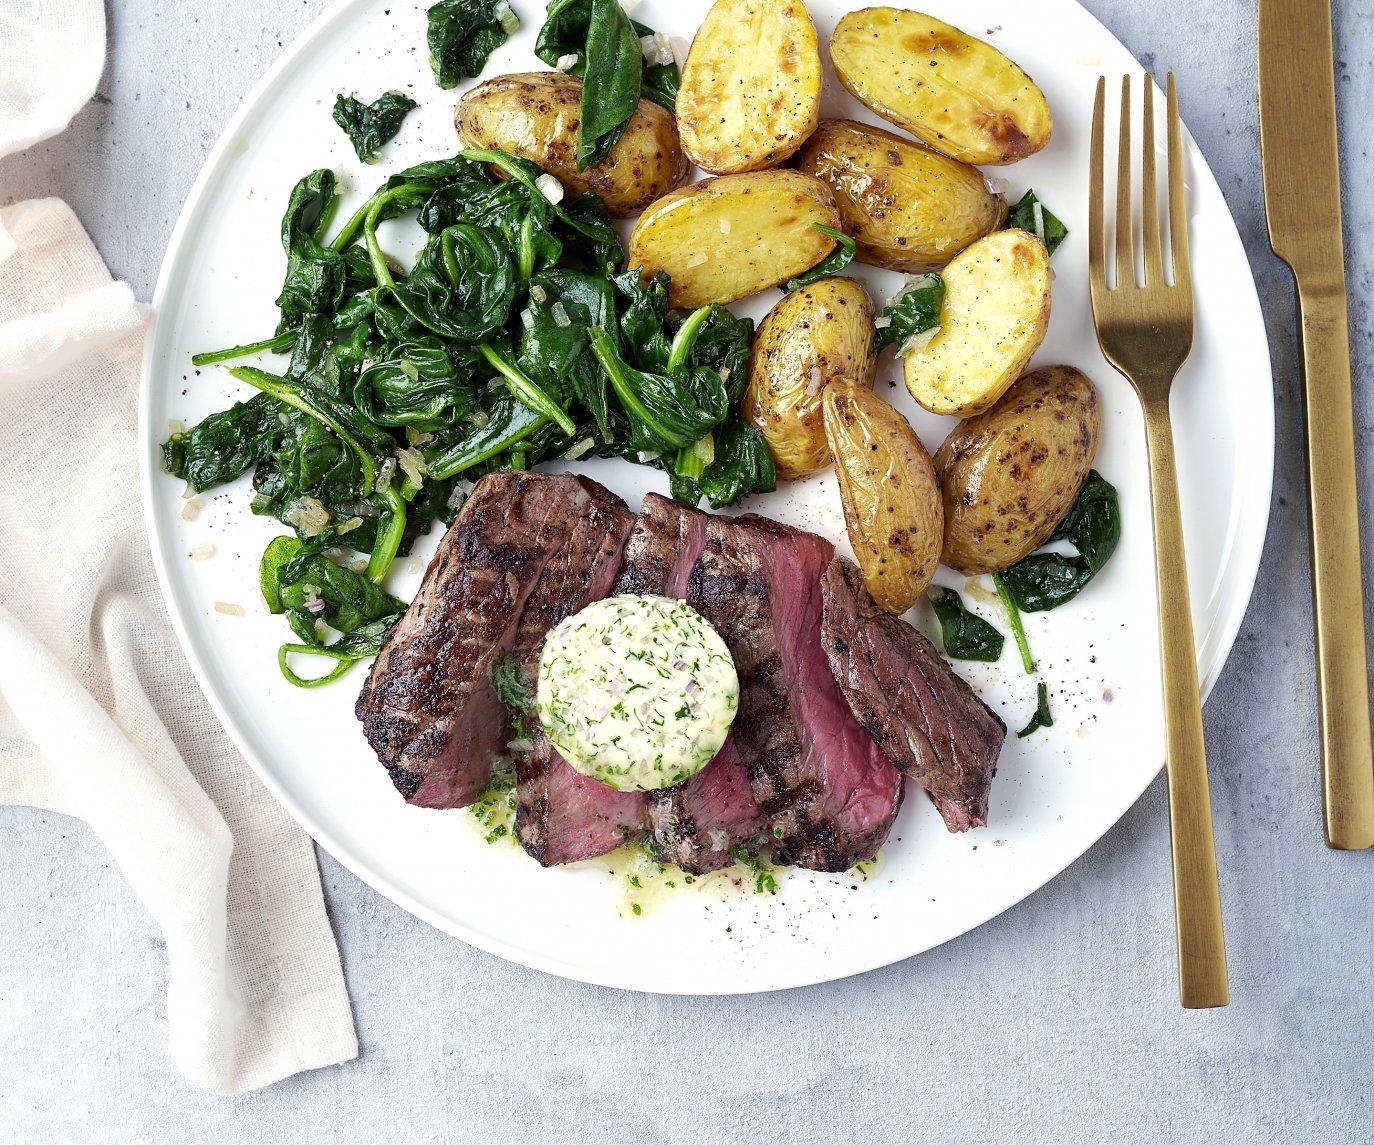 Gegrilde steak met kruidenboter, spinazie en krieltjes